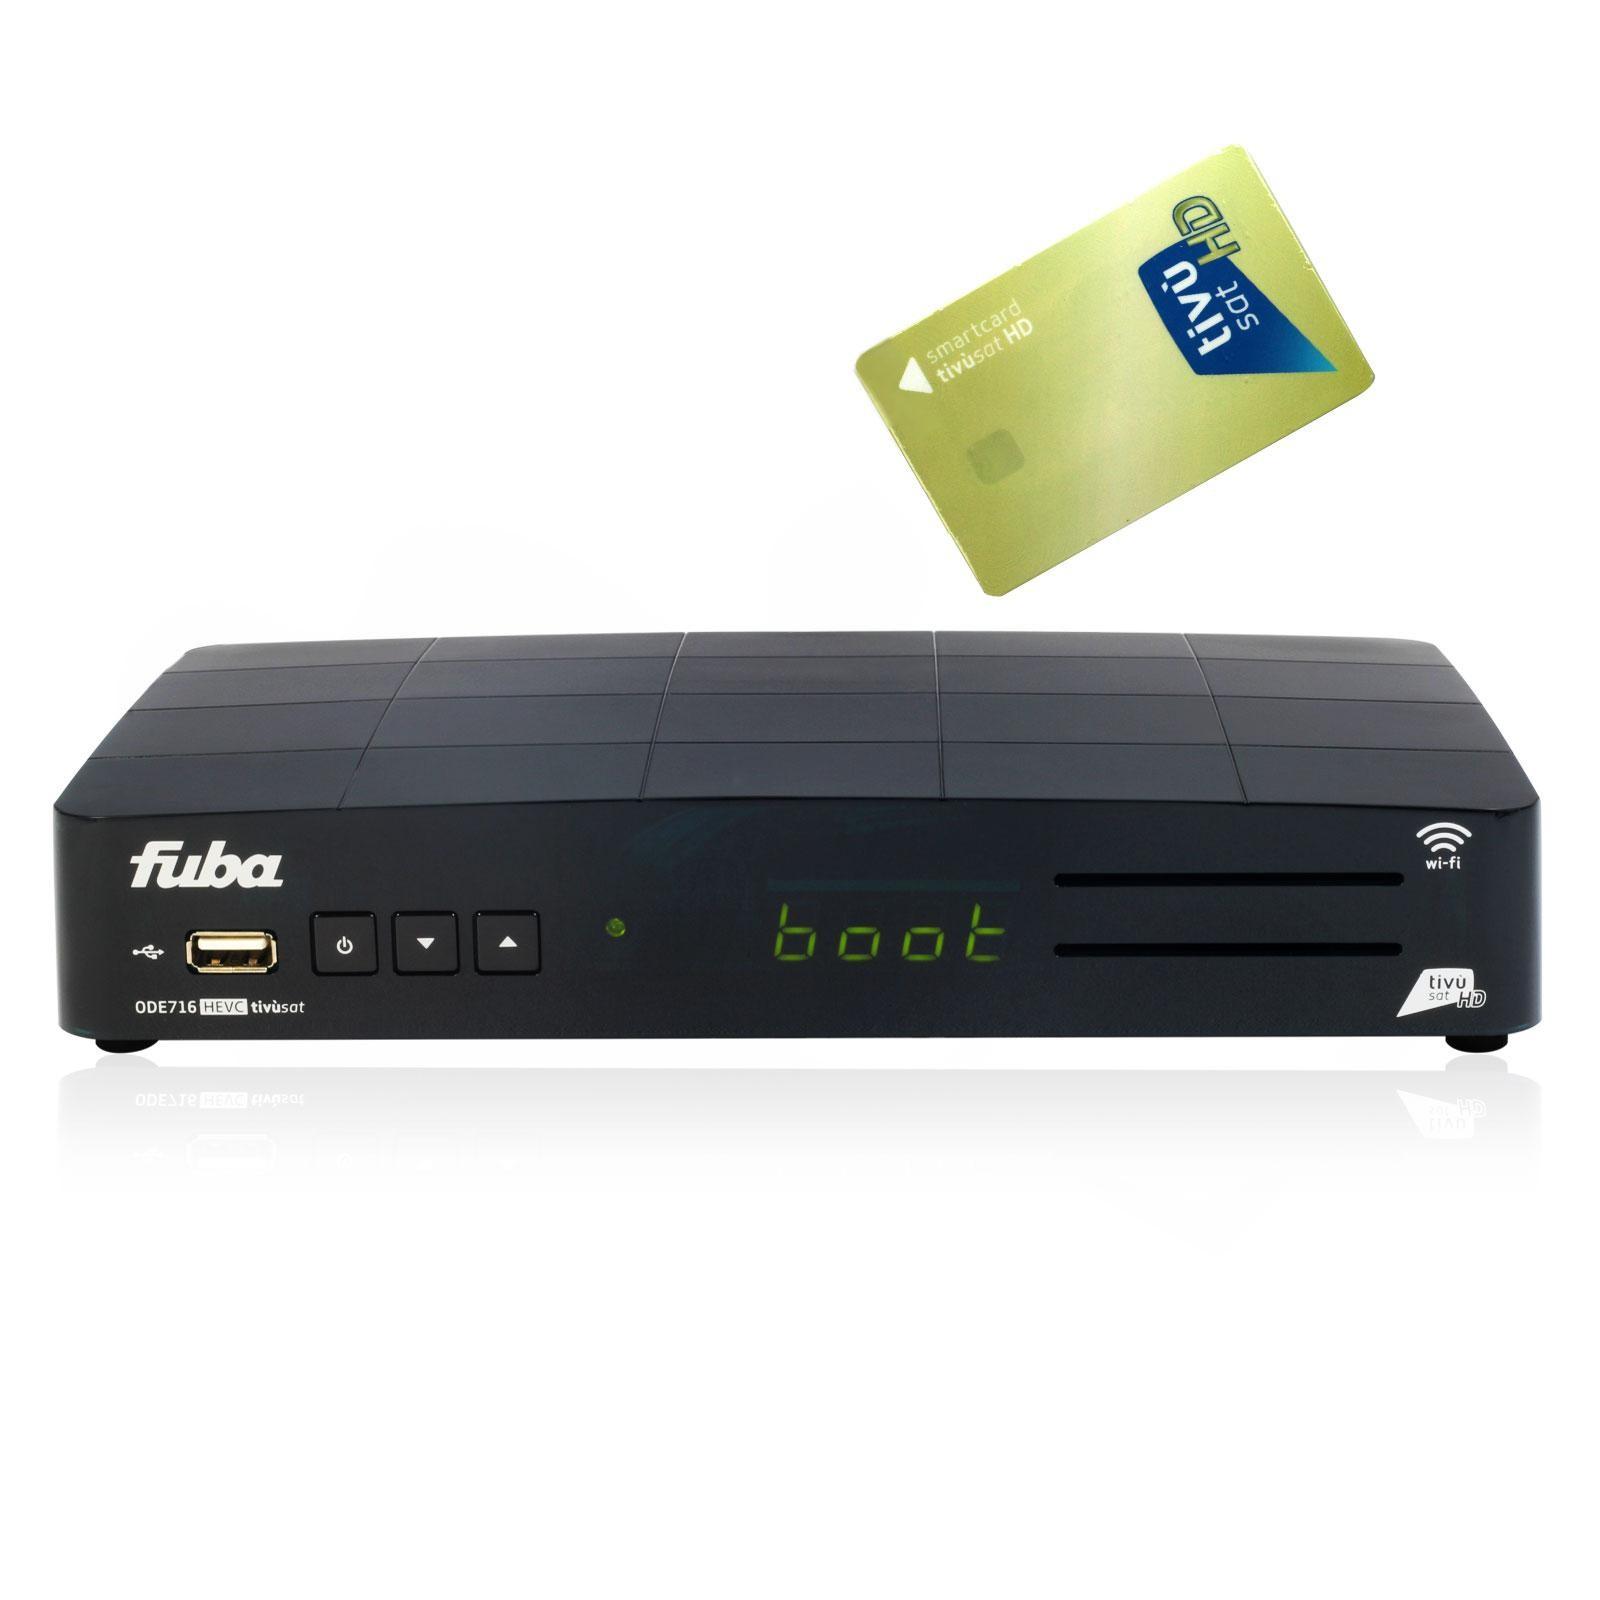 Tivusat Karte.Fuba Ode 716hd Wifi Tivu Full Hd Hevc Sat Receiver Tivusat Card